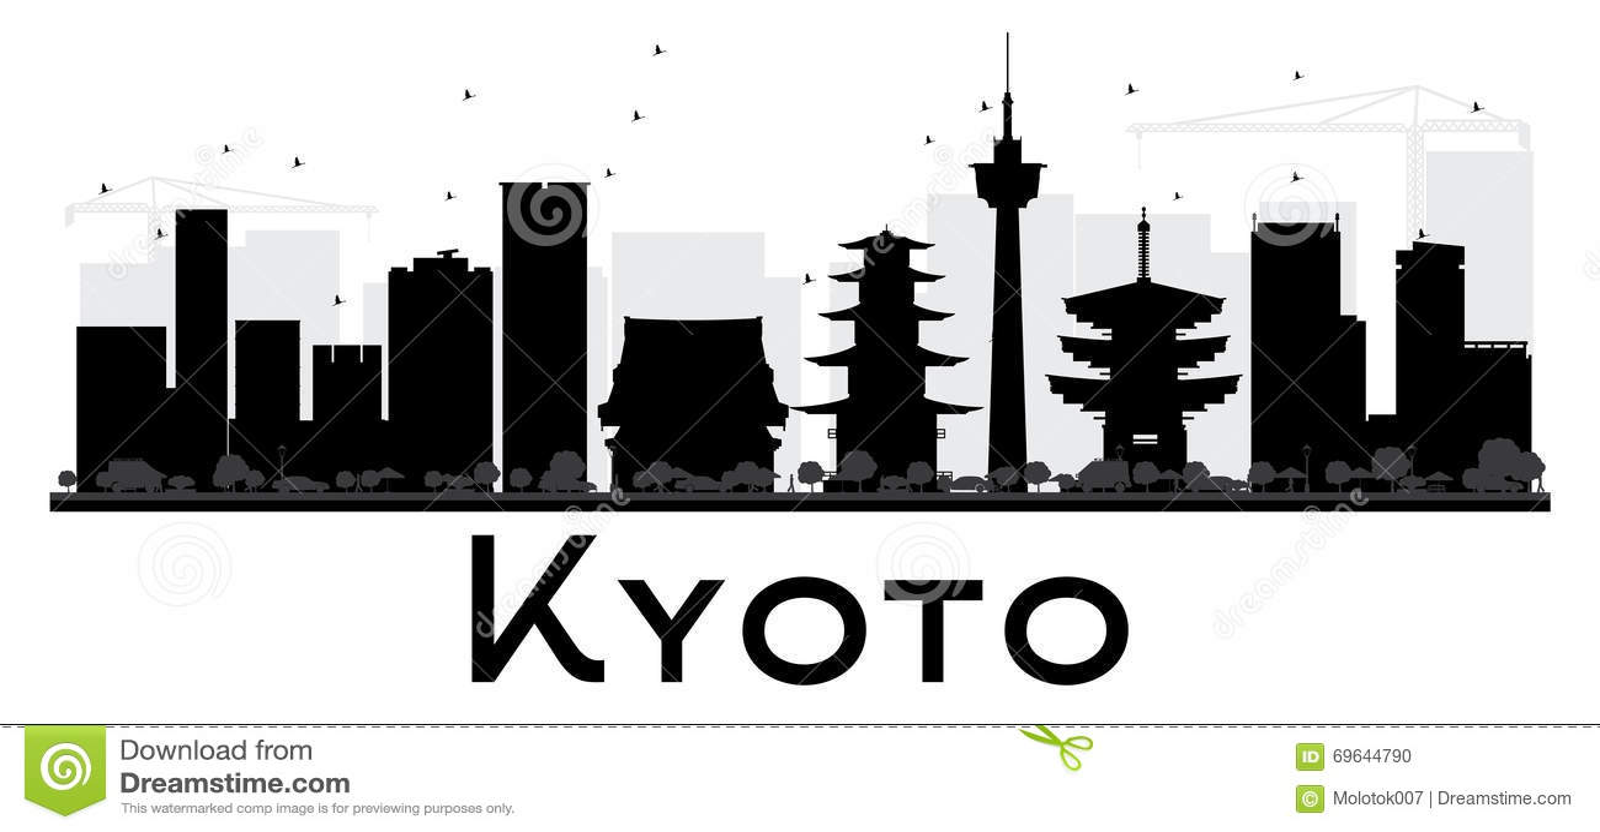 Kyoto City Skyline Black And White Silhouette Stock